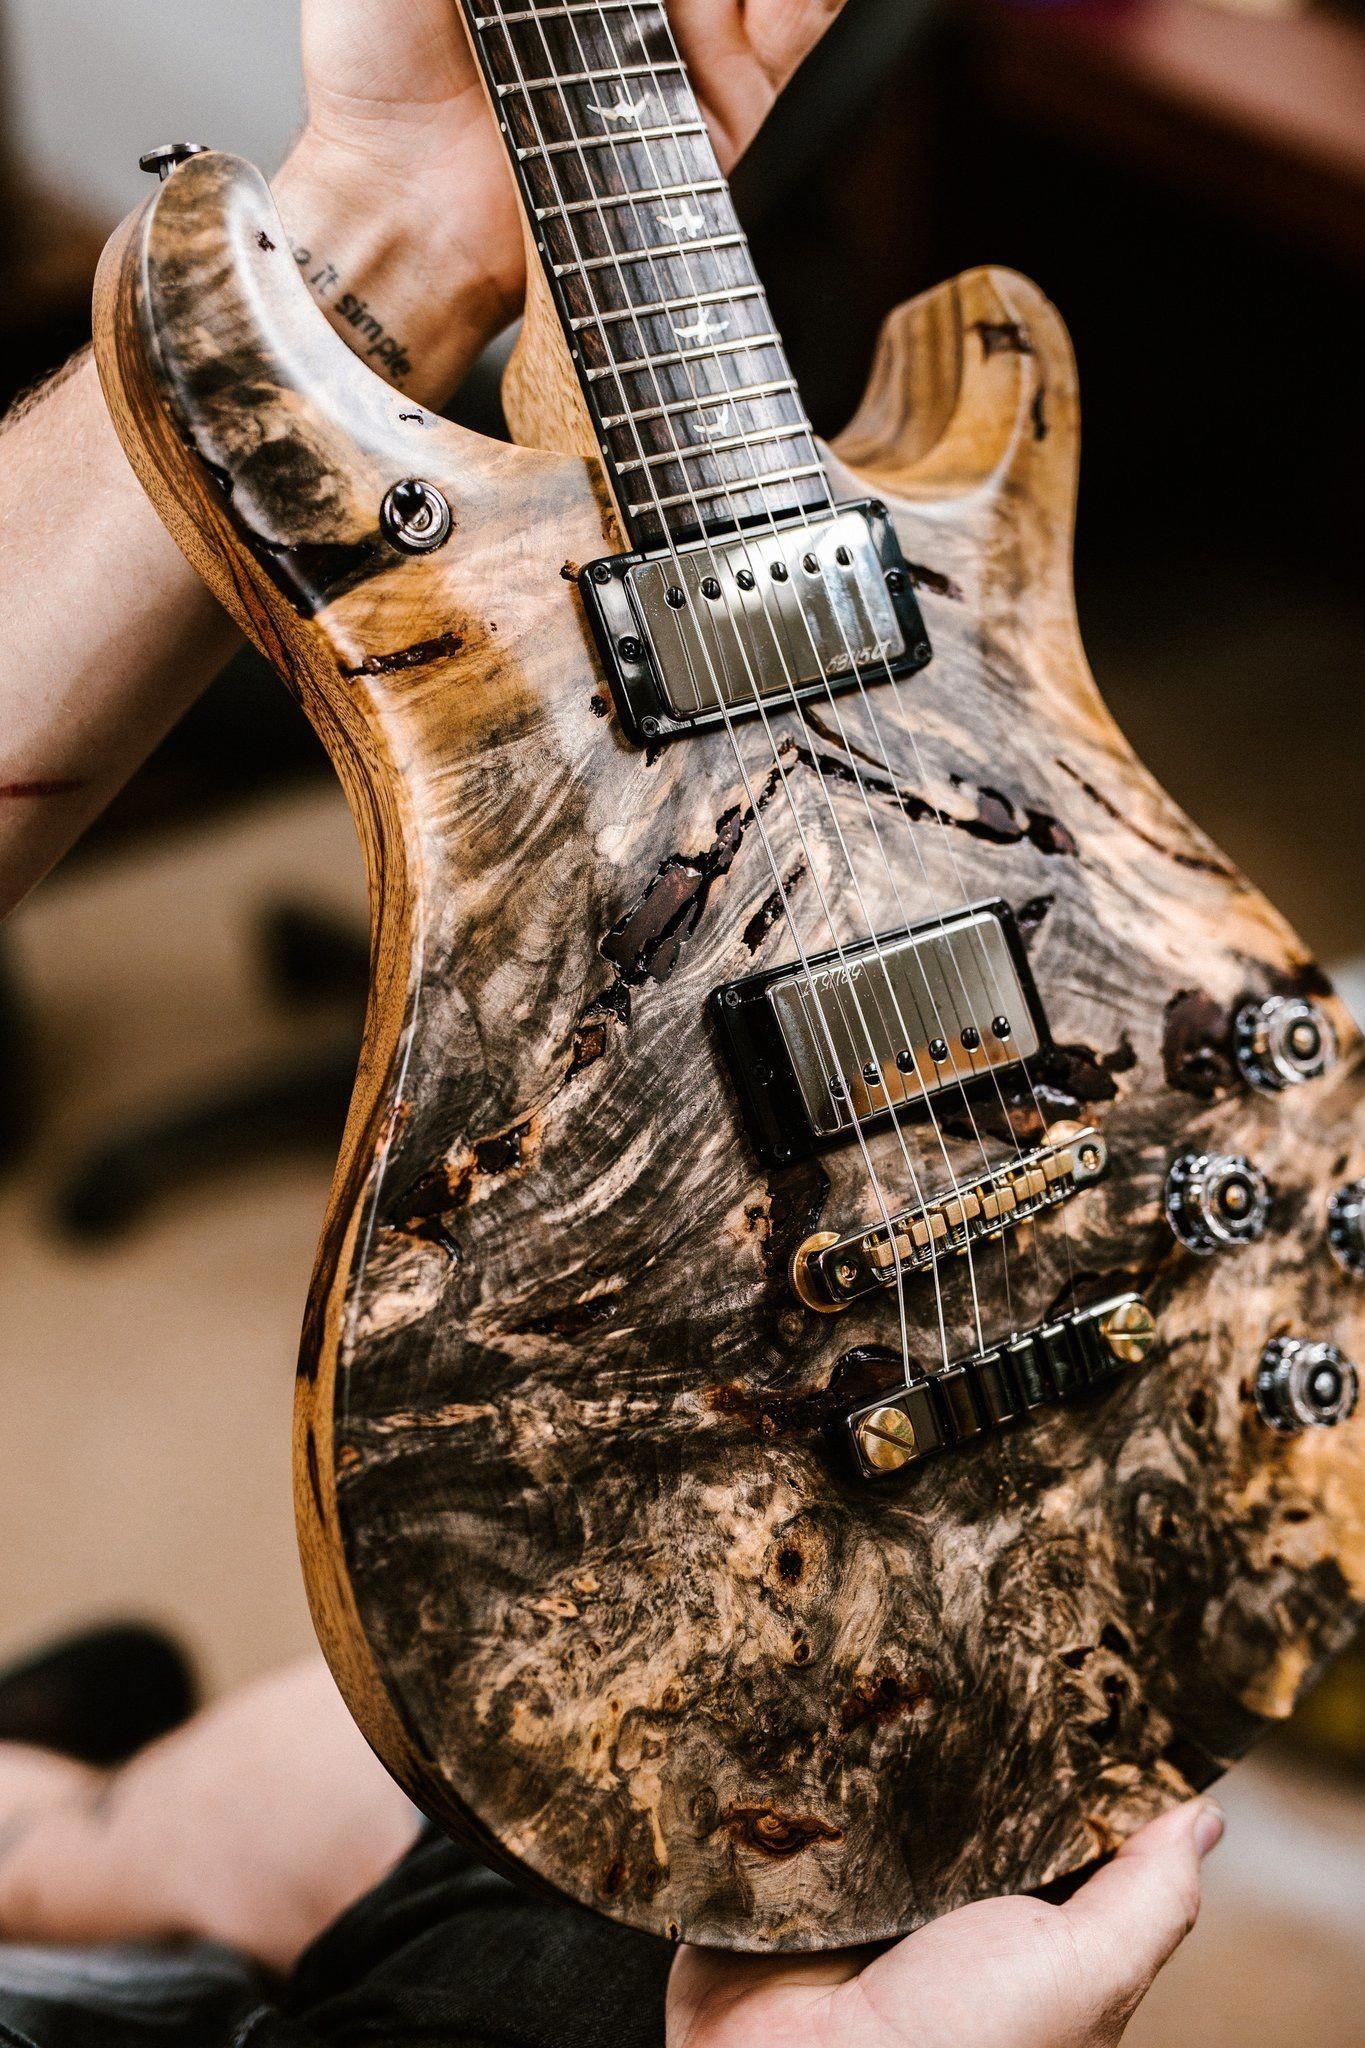 25 Awesome Prs Guitar Electric Prs Guitar Kit Diy Guitarplayer Guitarrista Prsguitars Prs Guitar Guitar Music Guitar